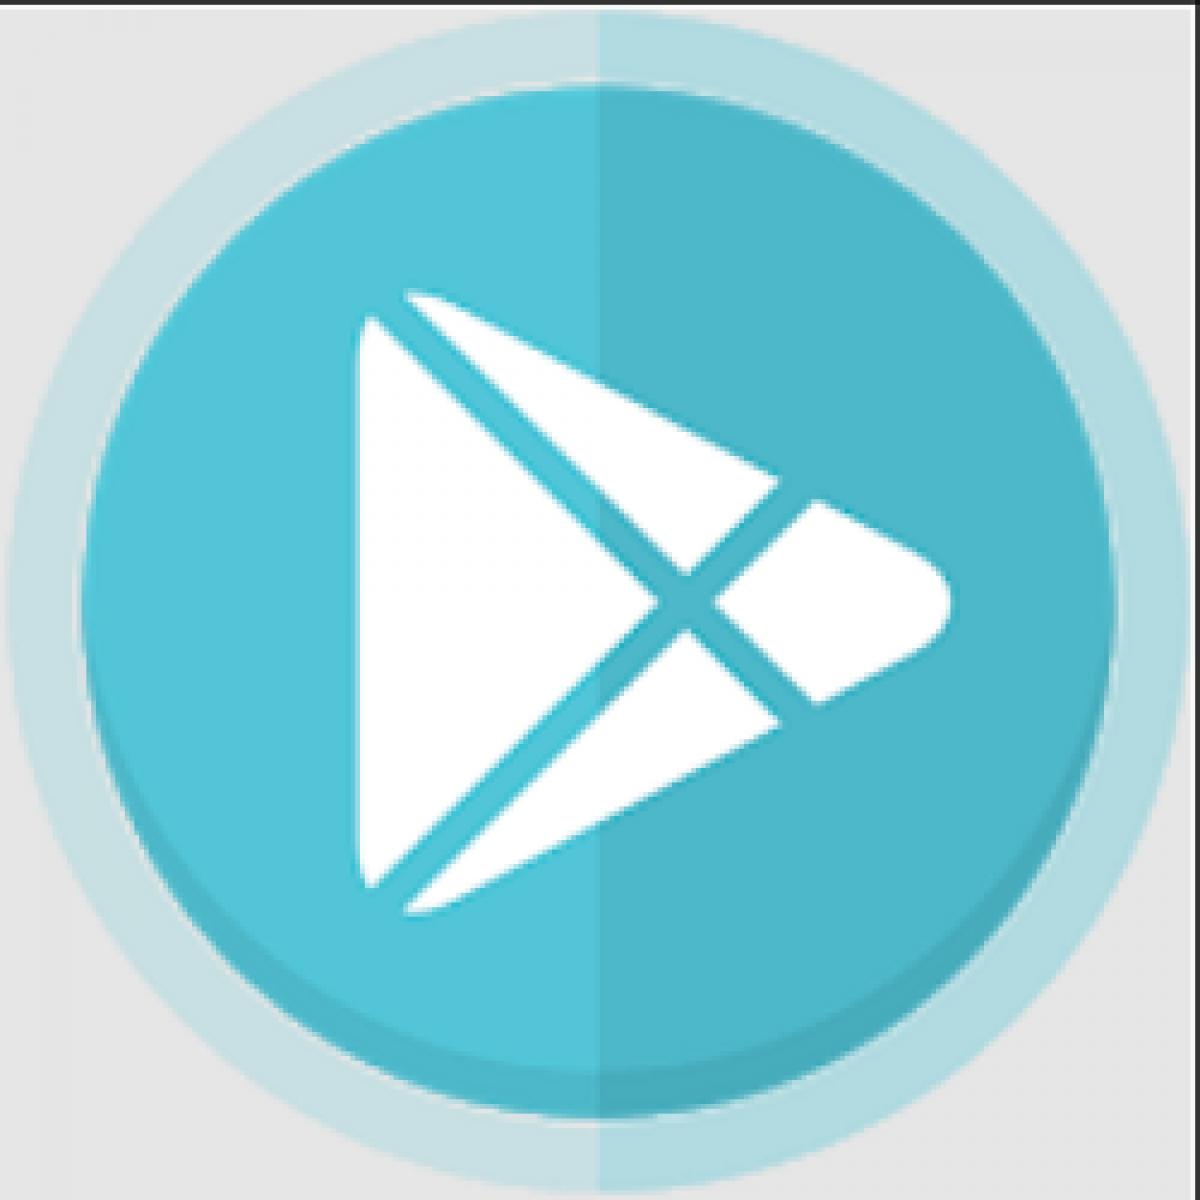 Cuevana 3 Pro Apk Download For Android Movie Iptv Apkshelf